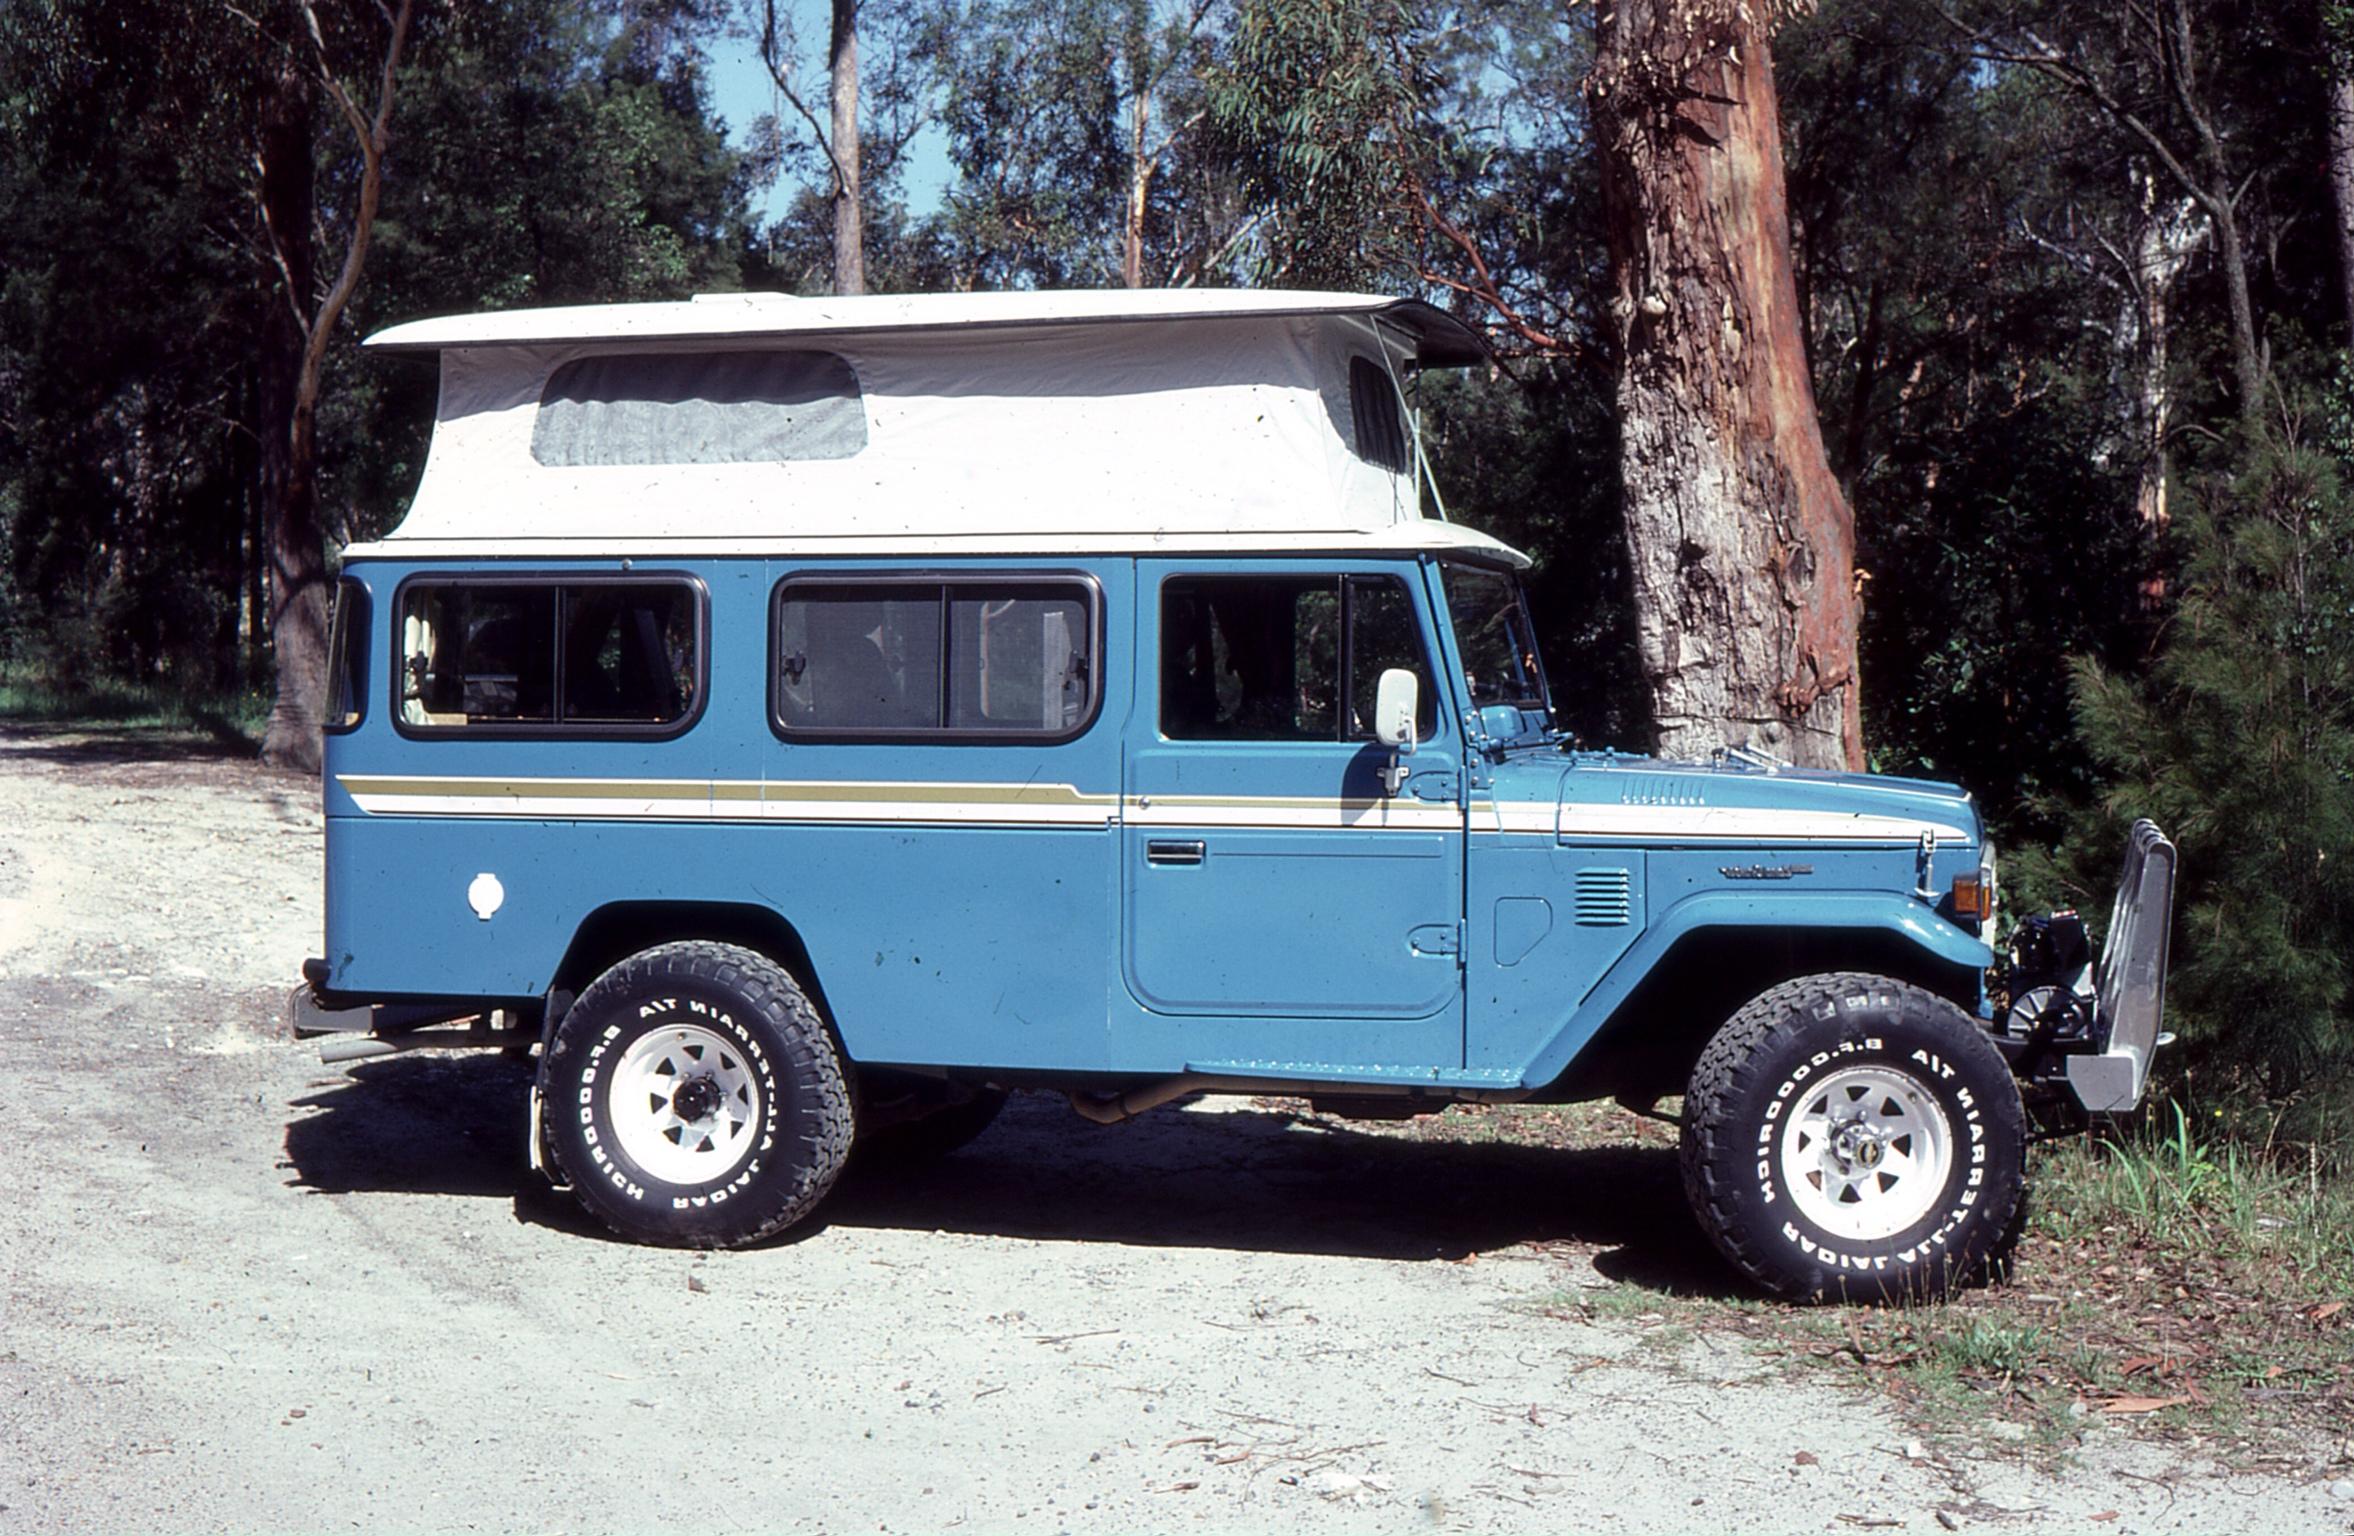 Late 1979 Trakka Landcruiser